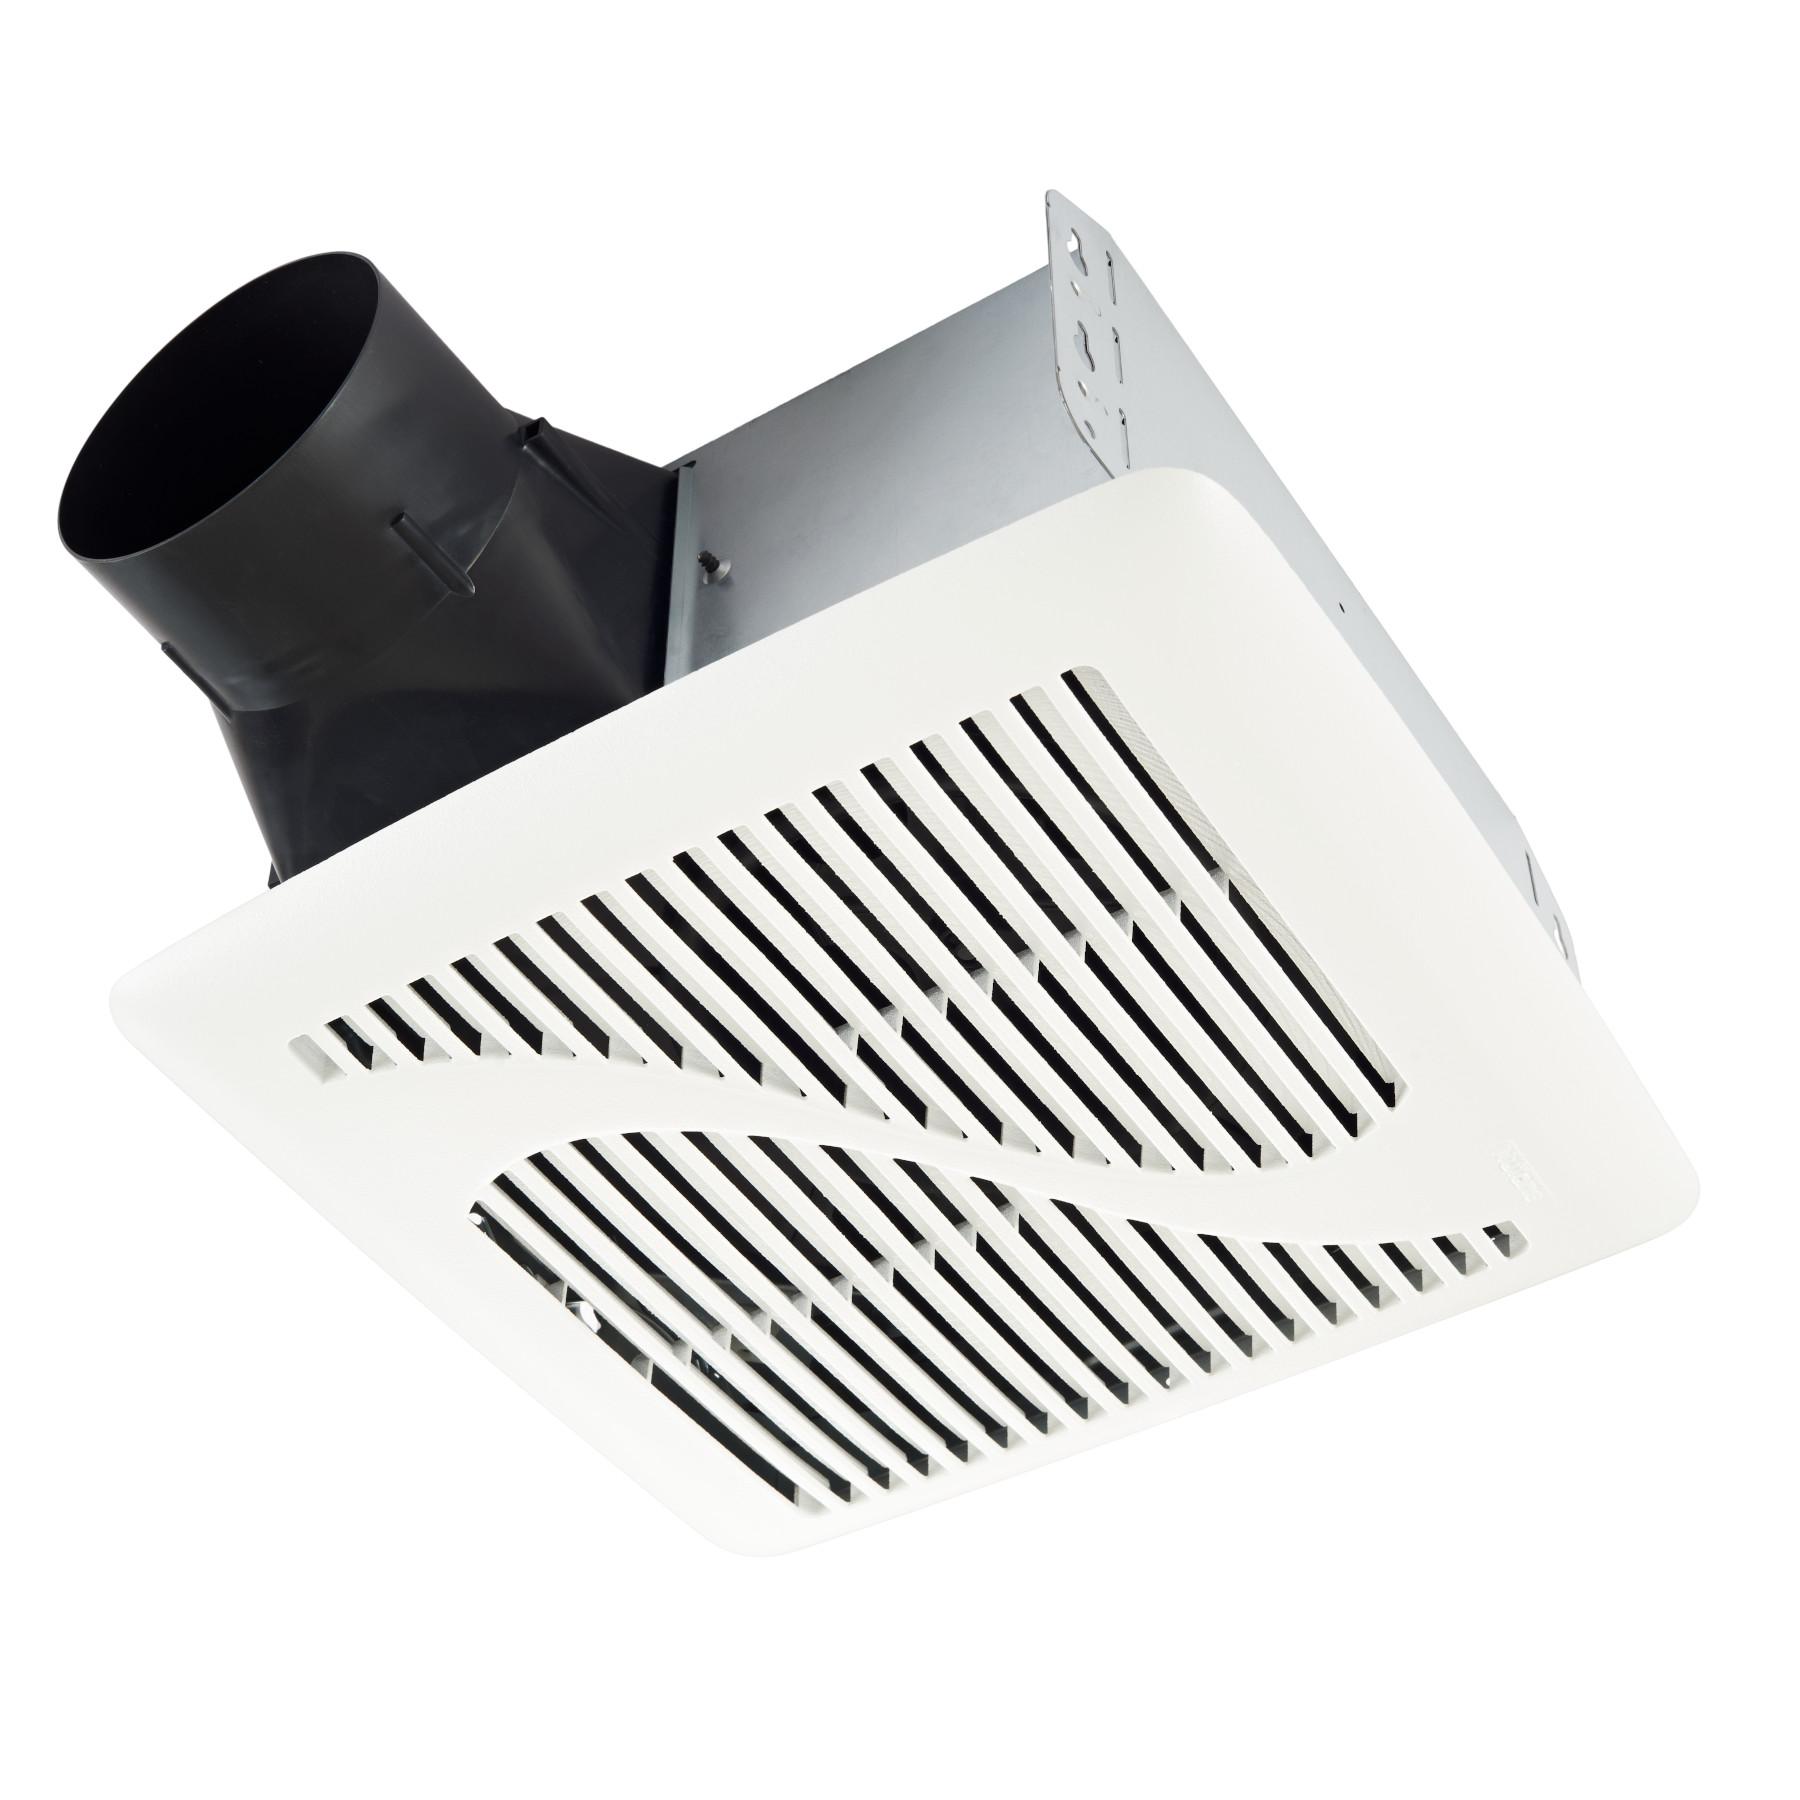 Aern110 Roomside Series 110 Cfm Ceiling Roomside Installation Bathroom Exhaust Fan Energy Star